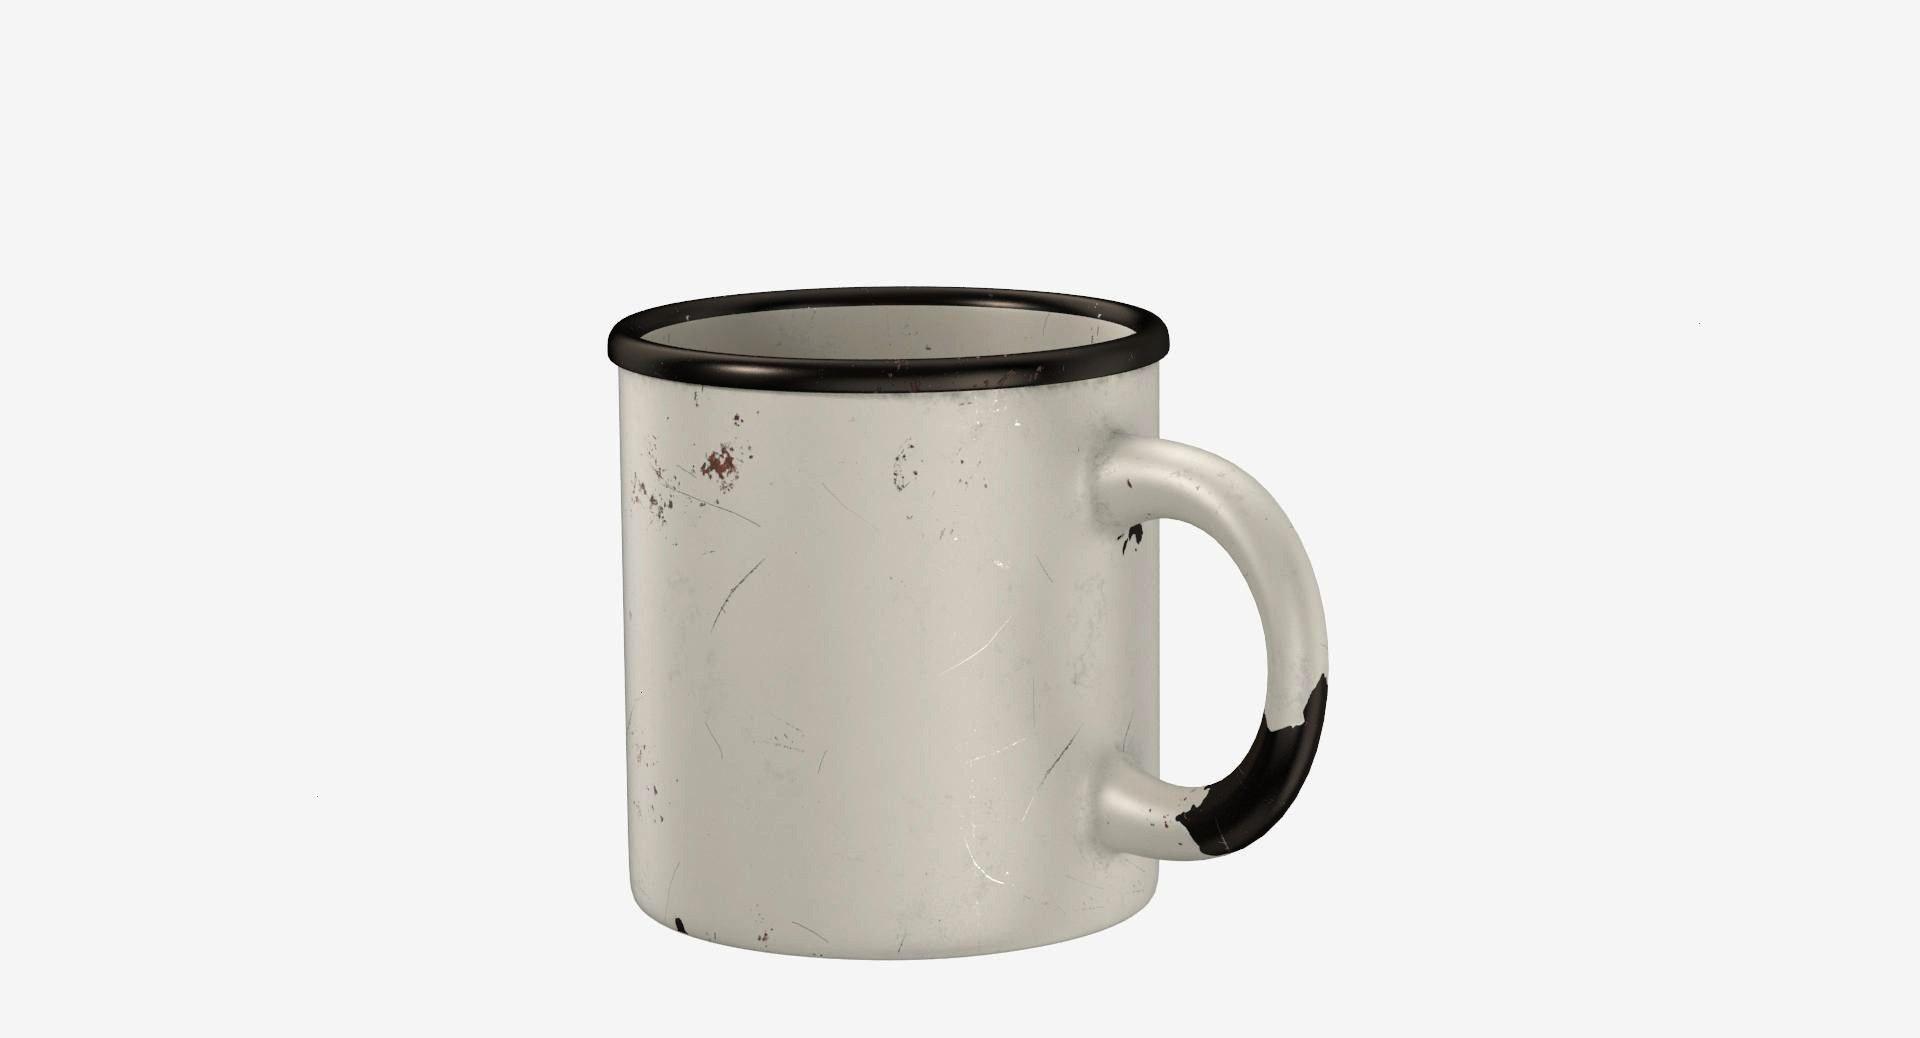 of iron 3D Model ,#Mug#iron#ModelMug of iron 3D Model ,#Mug#iron#Model Mug 3D Model ,#Mug#Model S